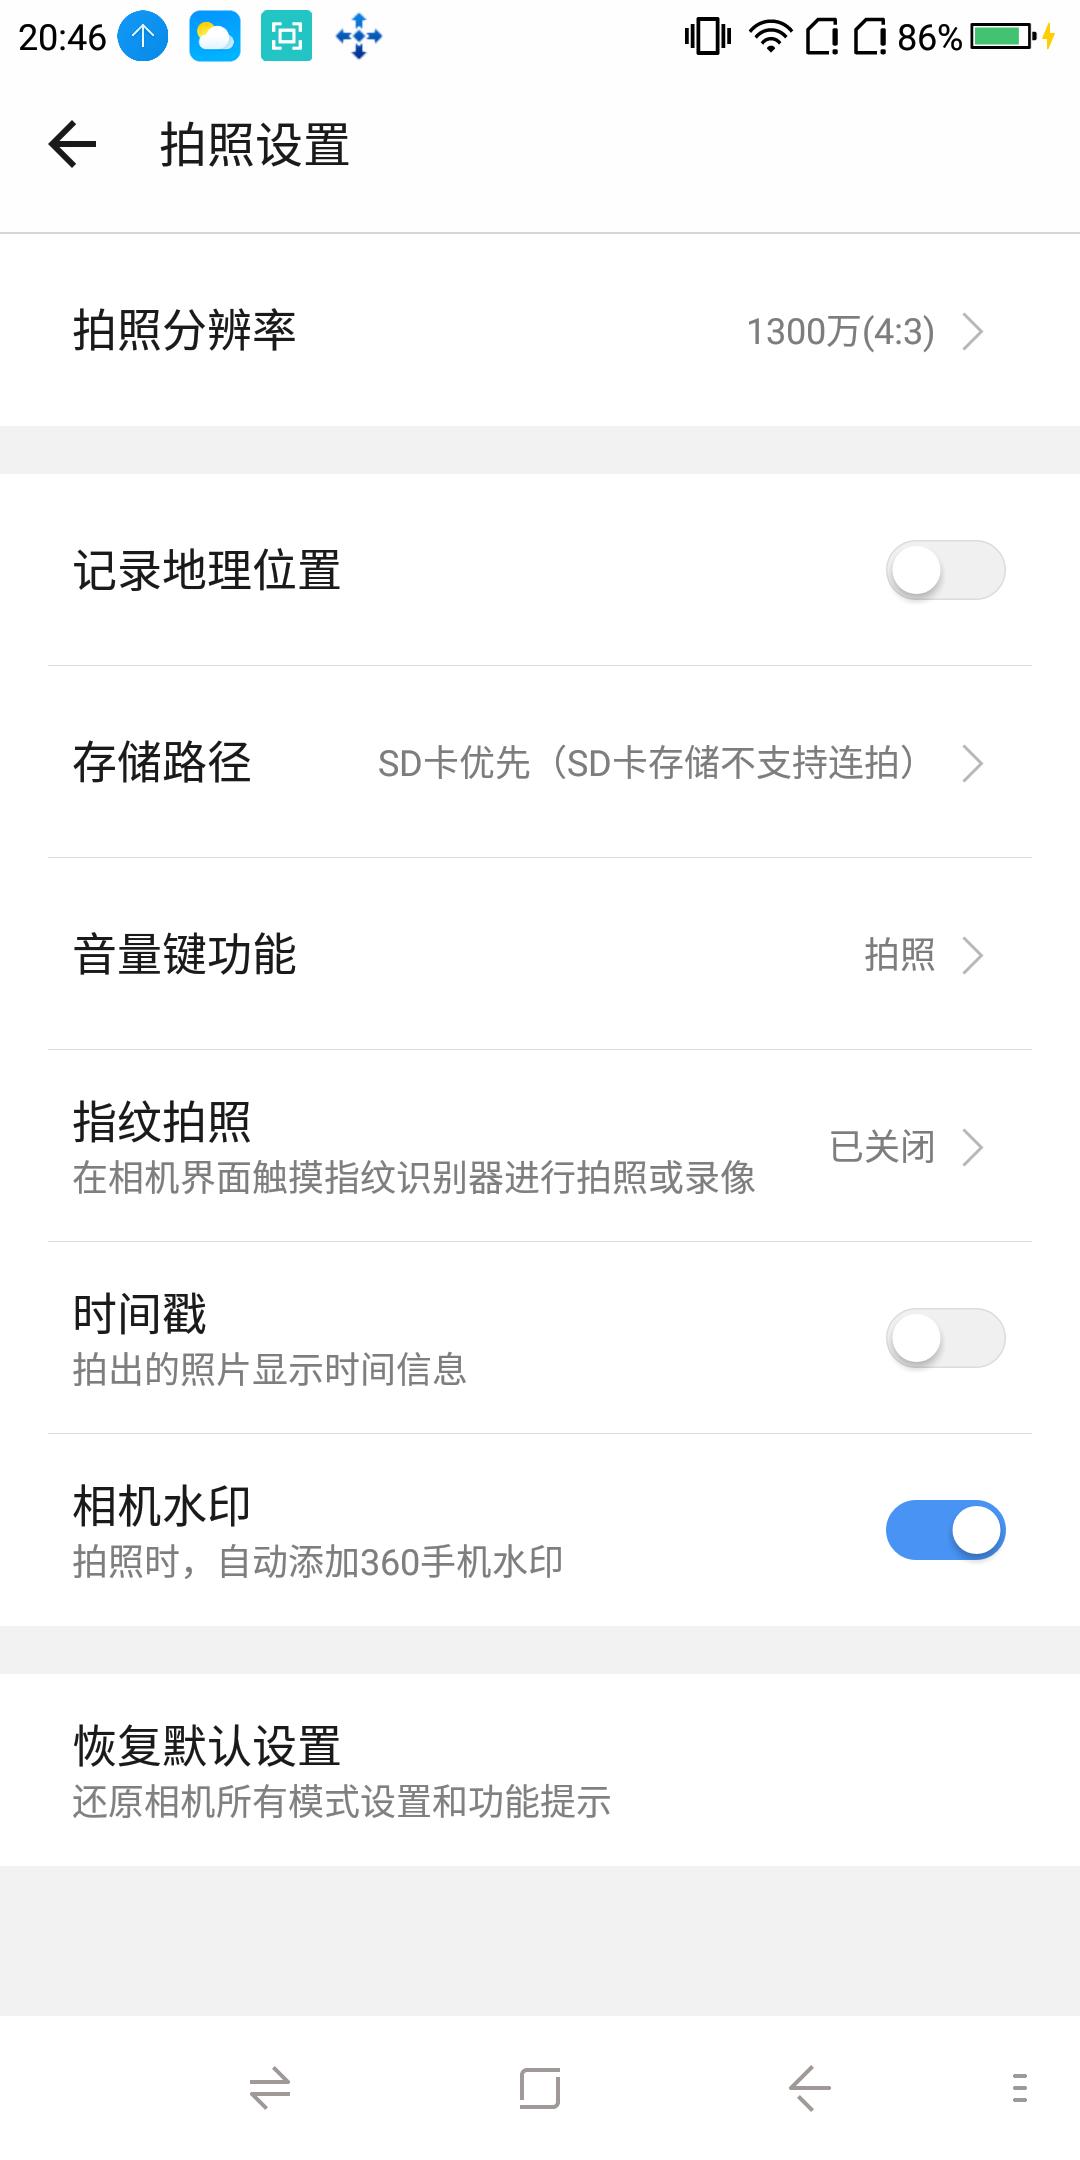 Screenshot_2018-08-22-20-46-57.png